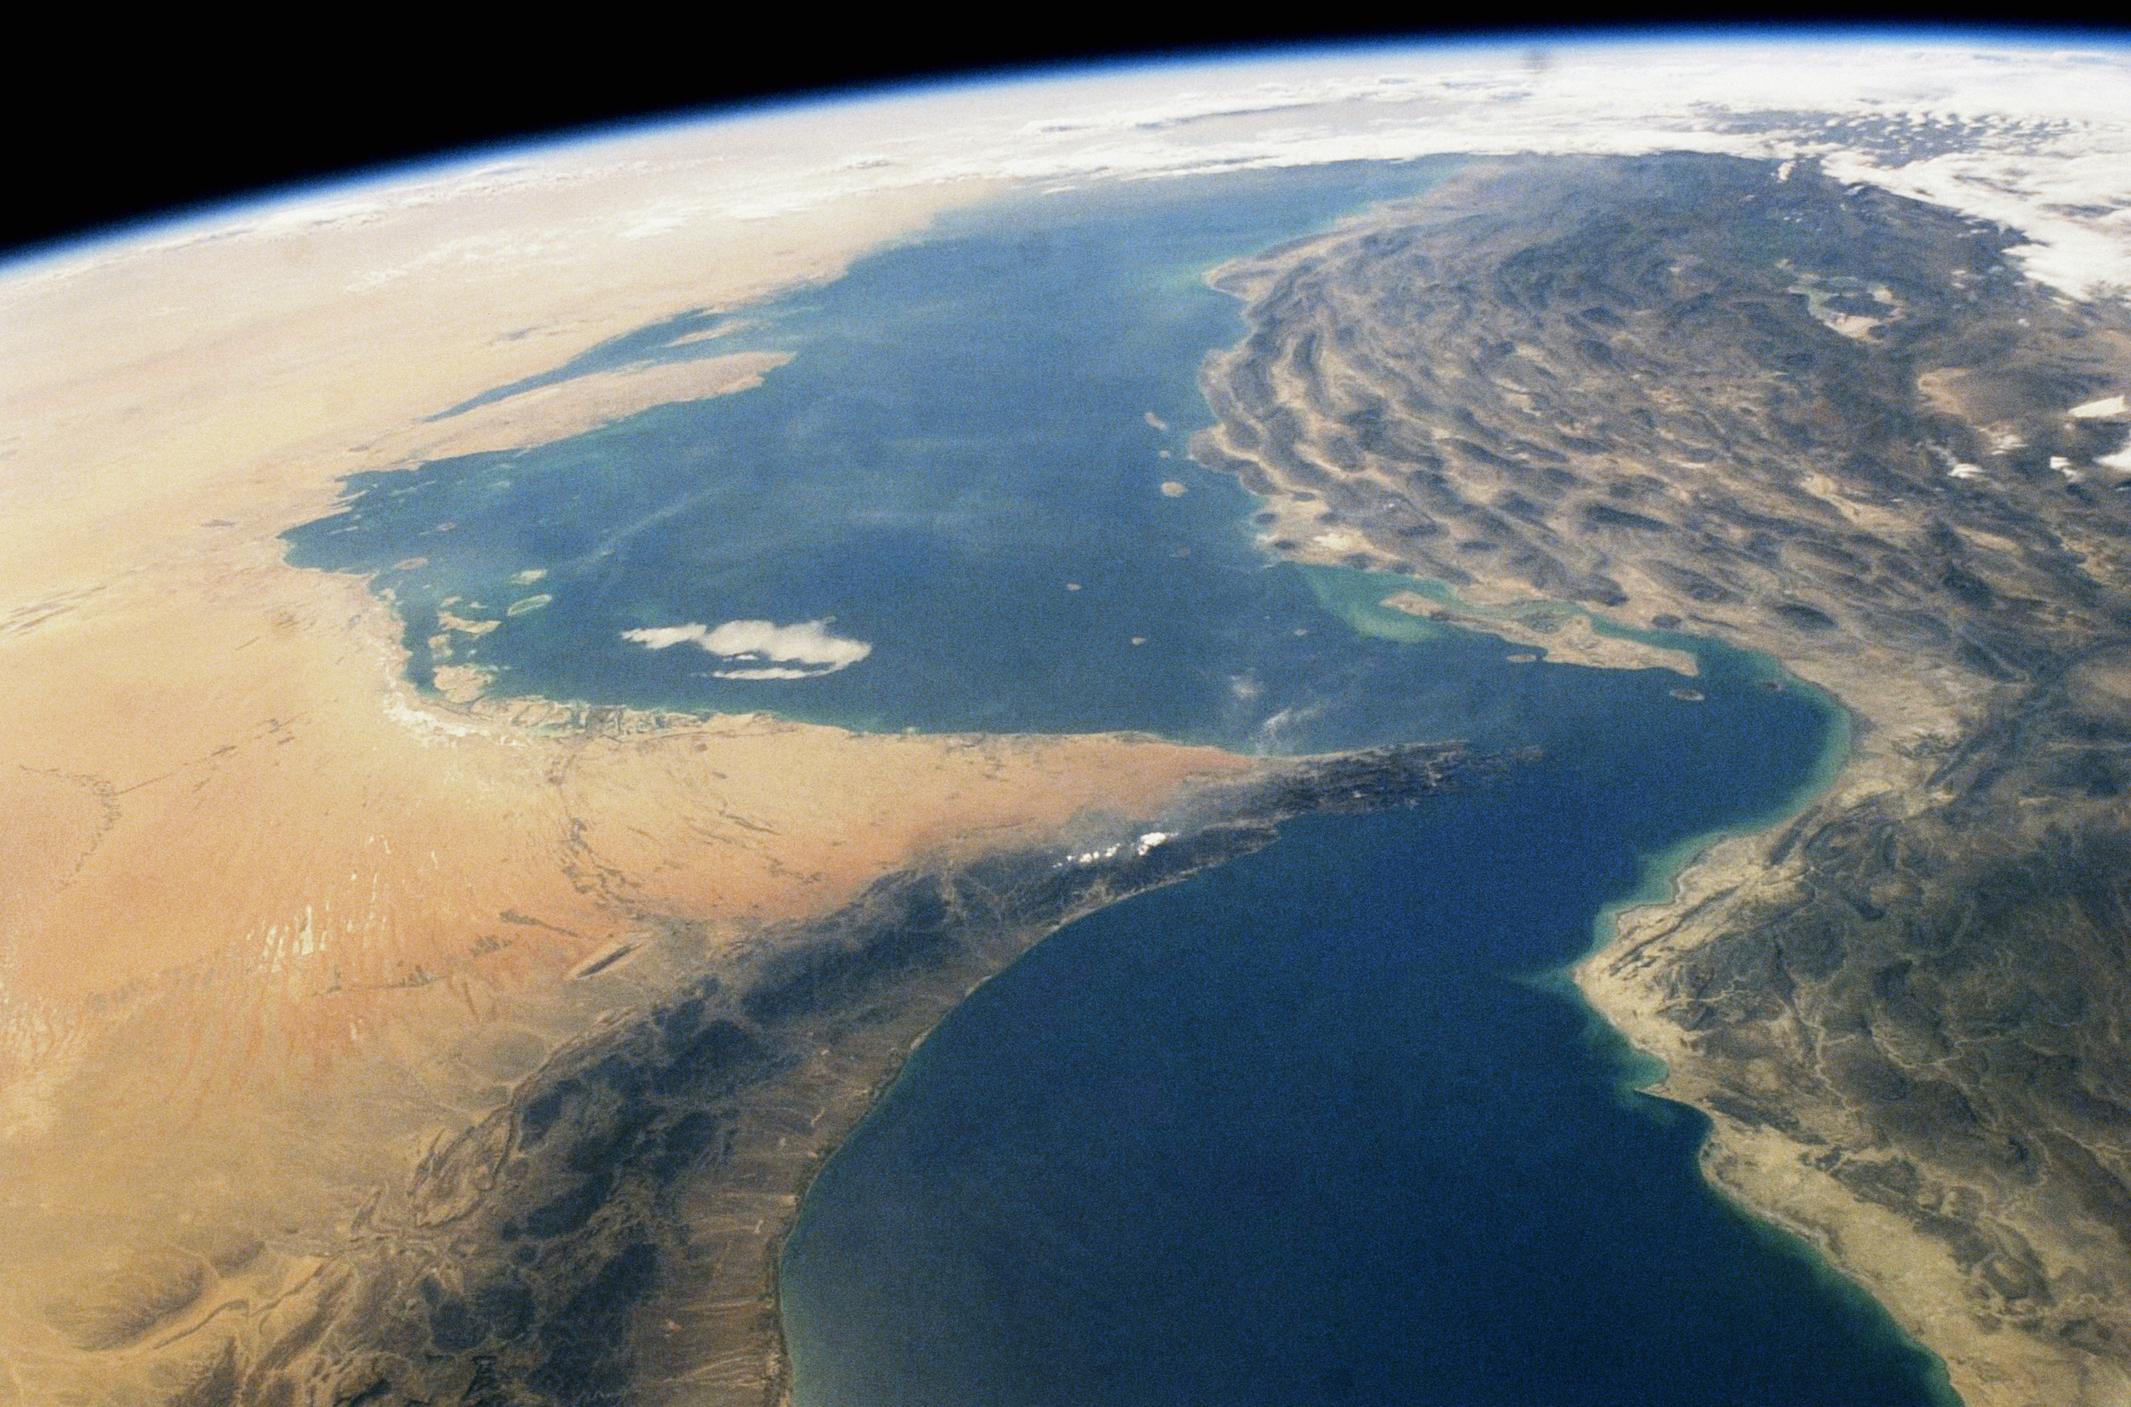 Middle East, Persian Gulf region, Strait of Hormuz, satellite view